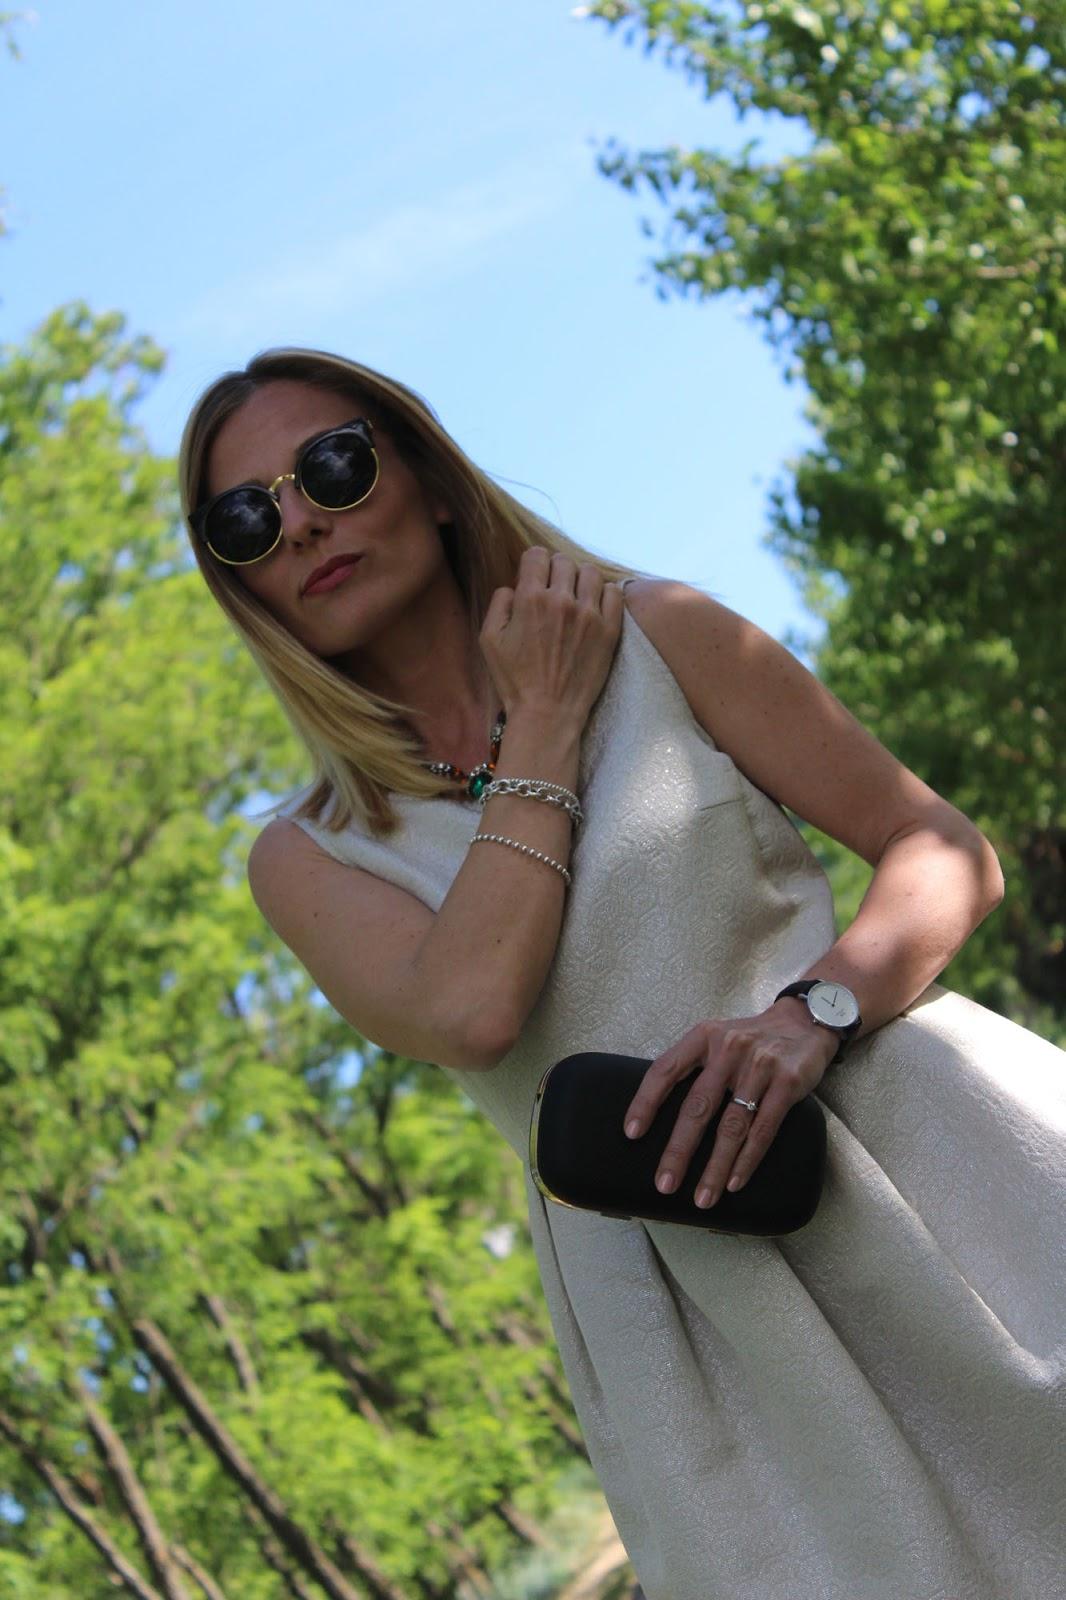 Eniwhere Fashion - Dress clutch and black heels